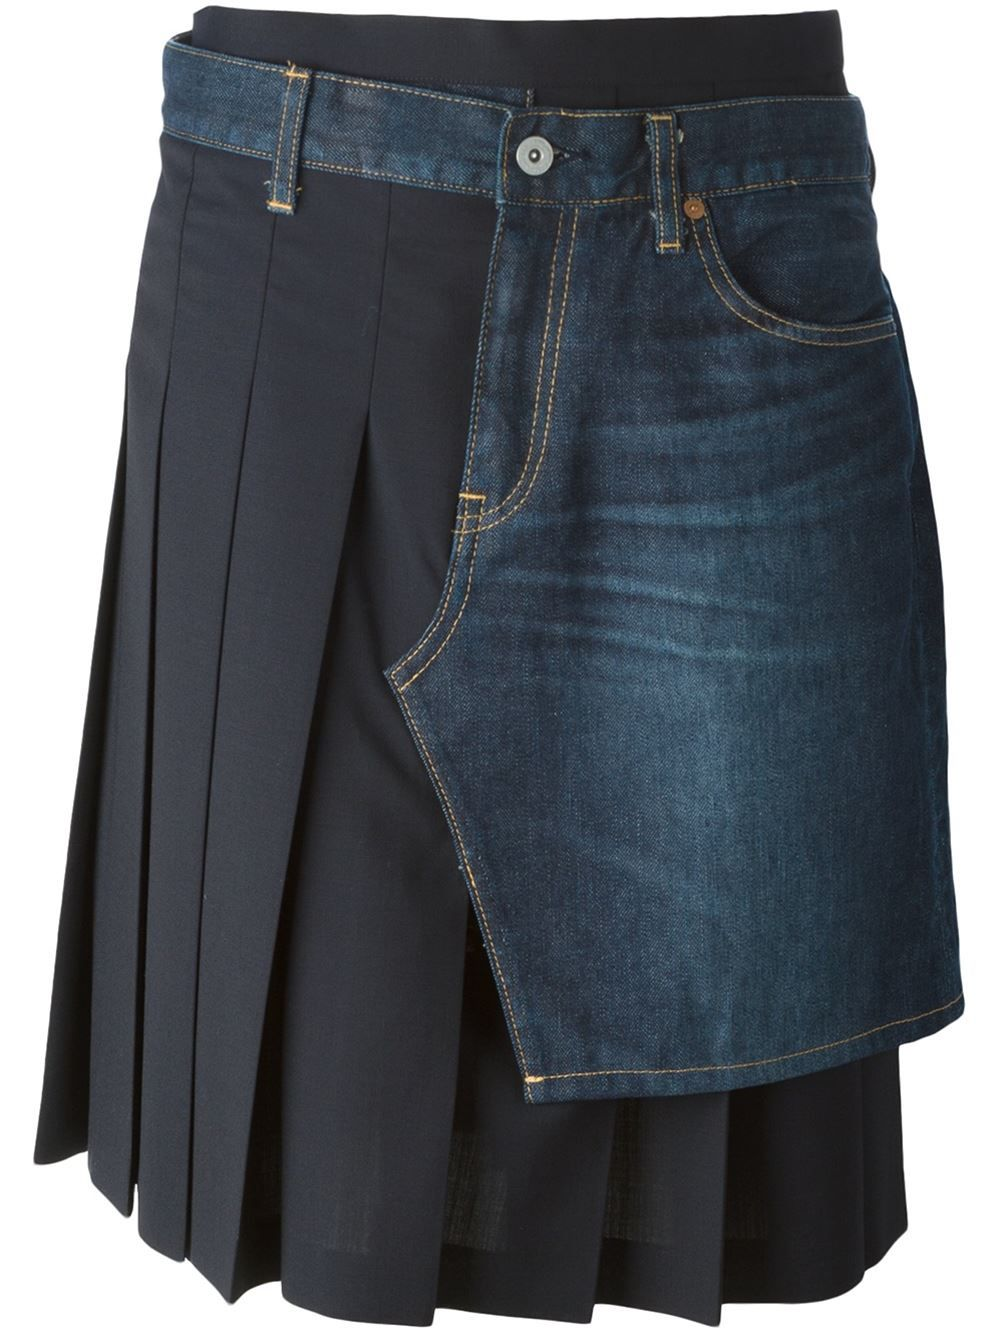 600d648dc6 Junya Watanabe Comme Des Garçons Pleated Denim Overlay Skirt - Boutique  Antonia - Farfetch.com